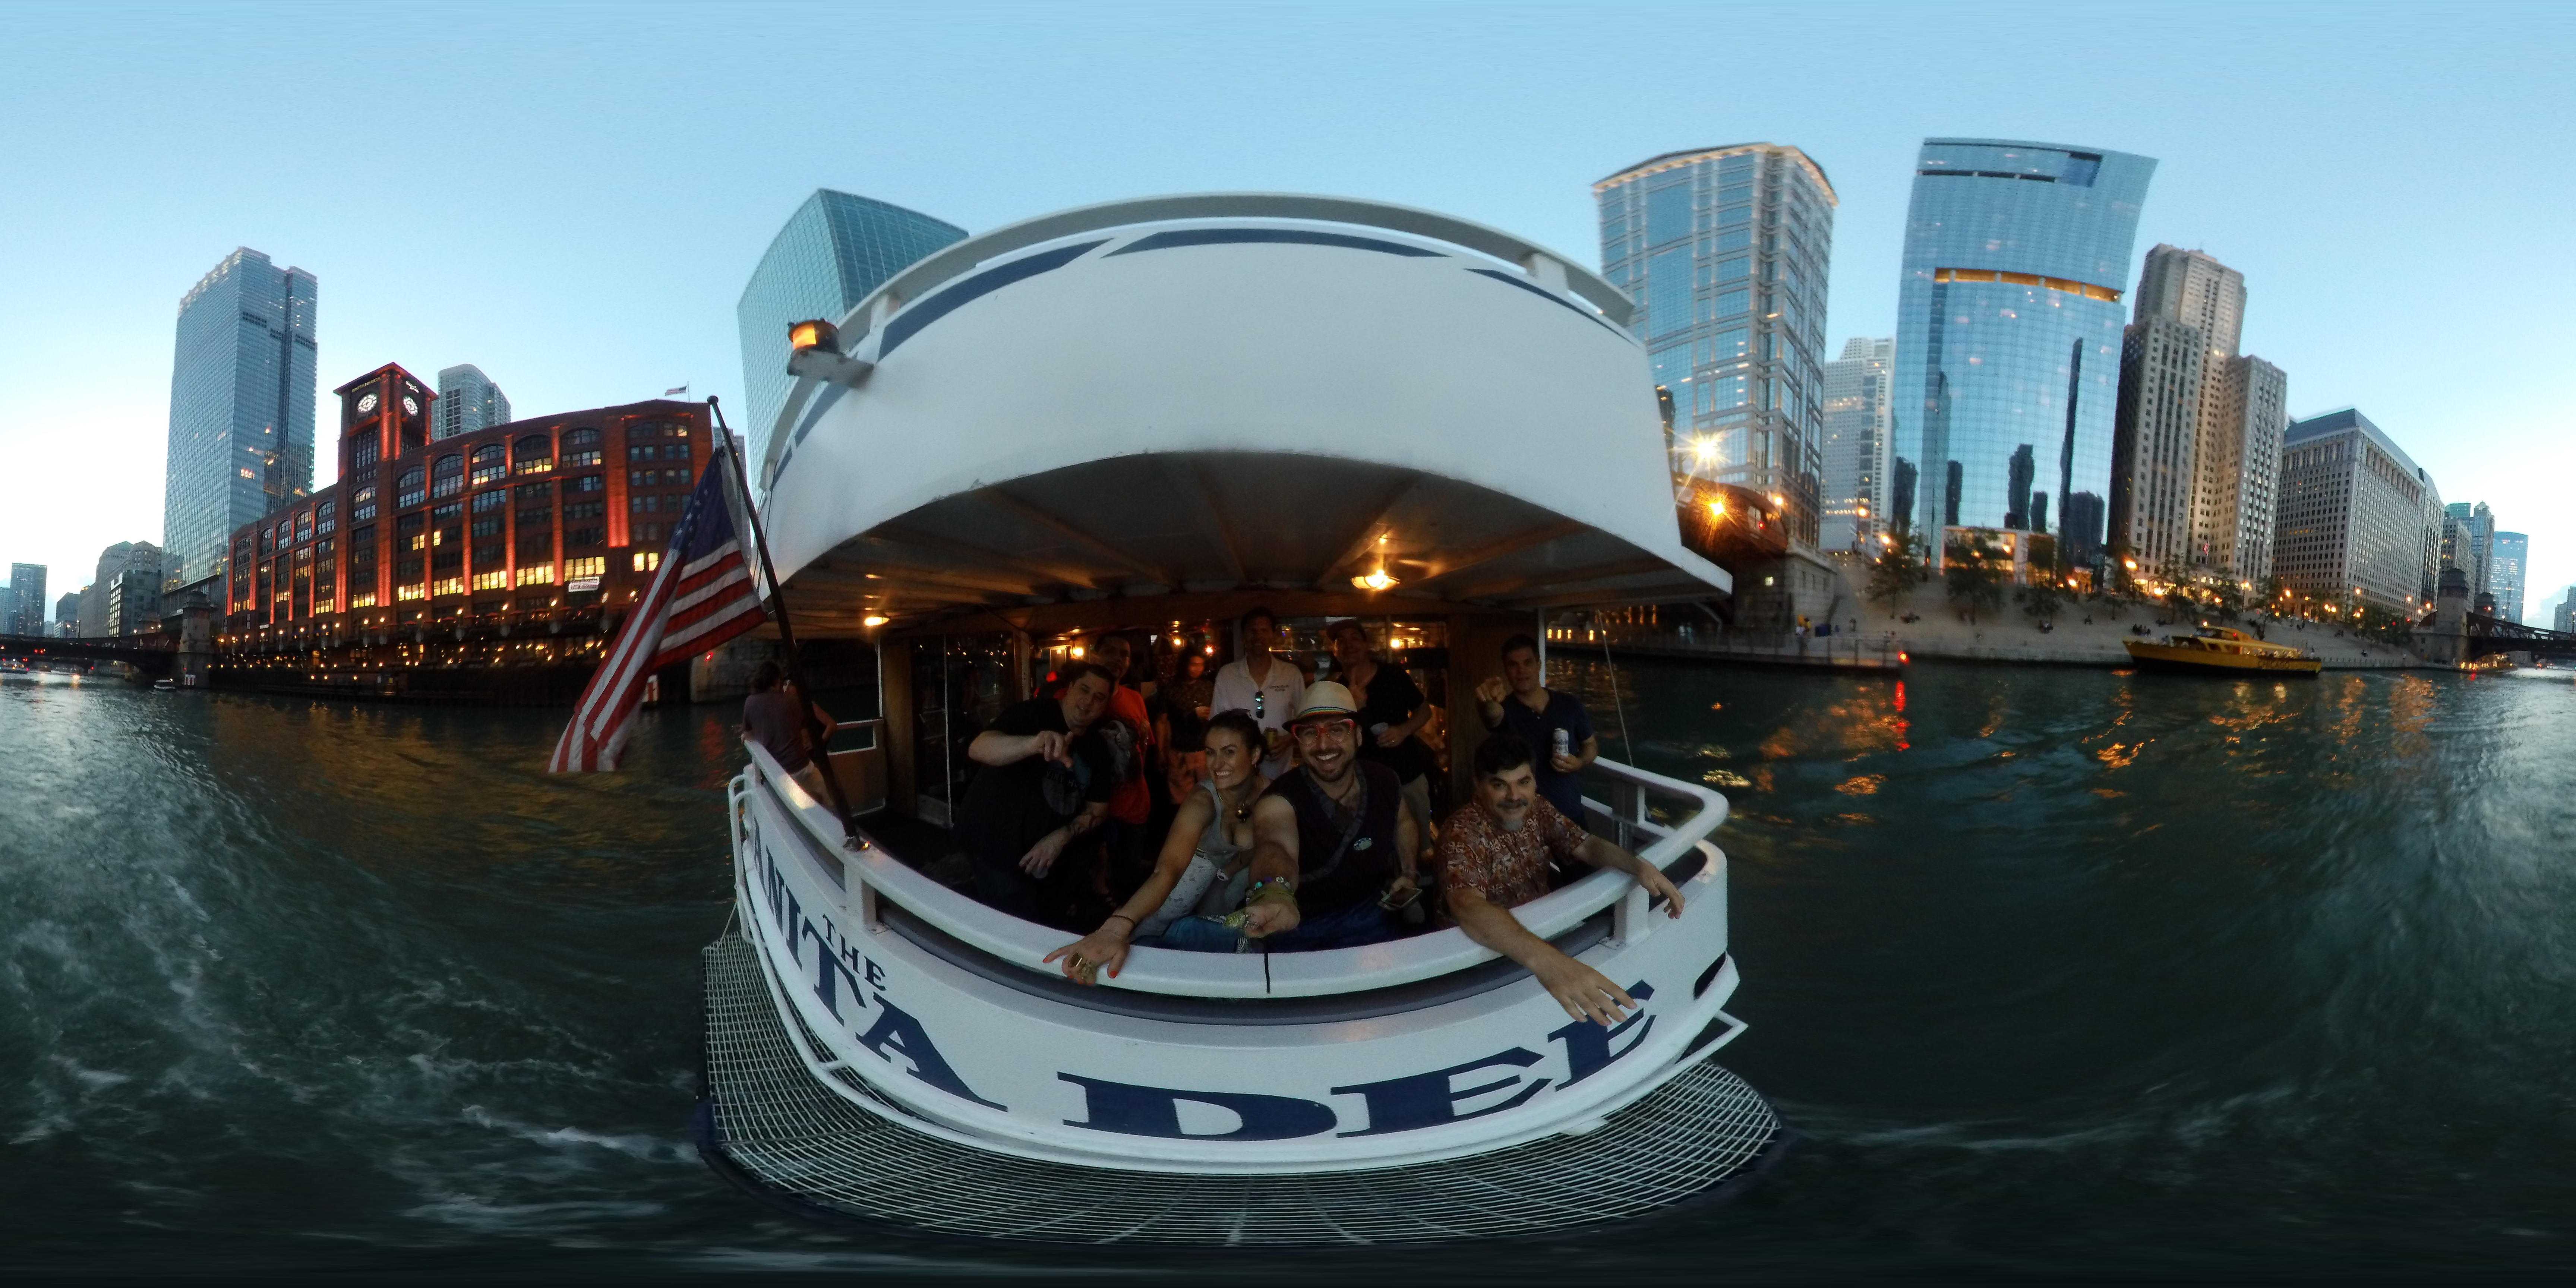 BM Cruise